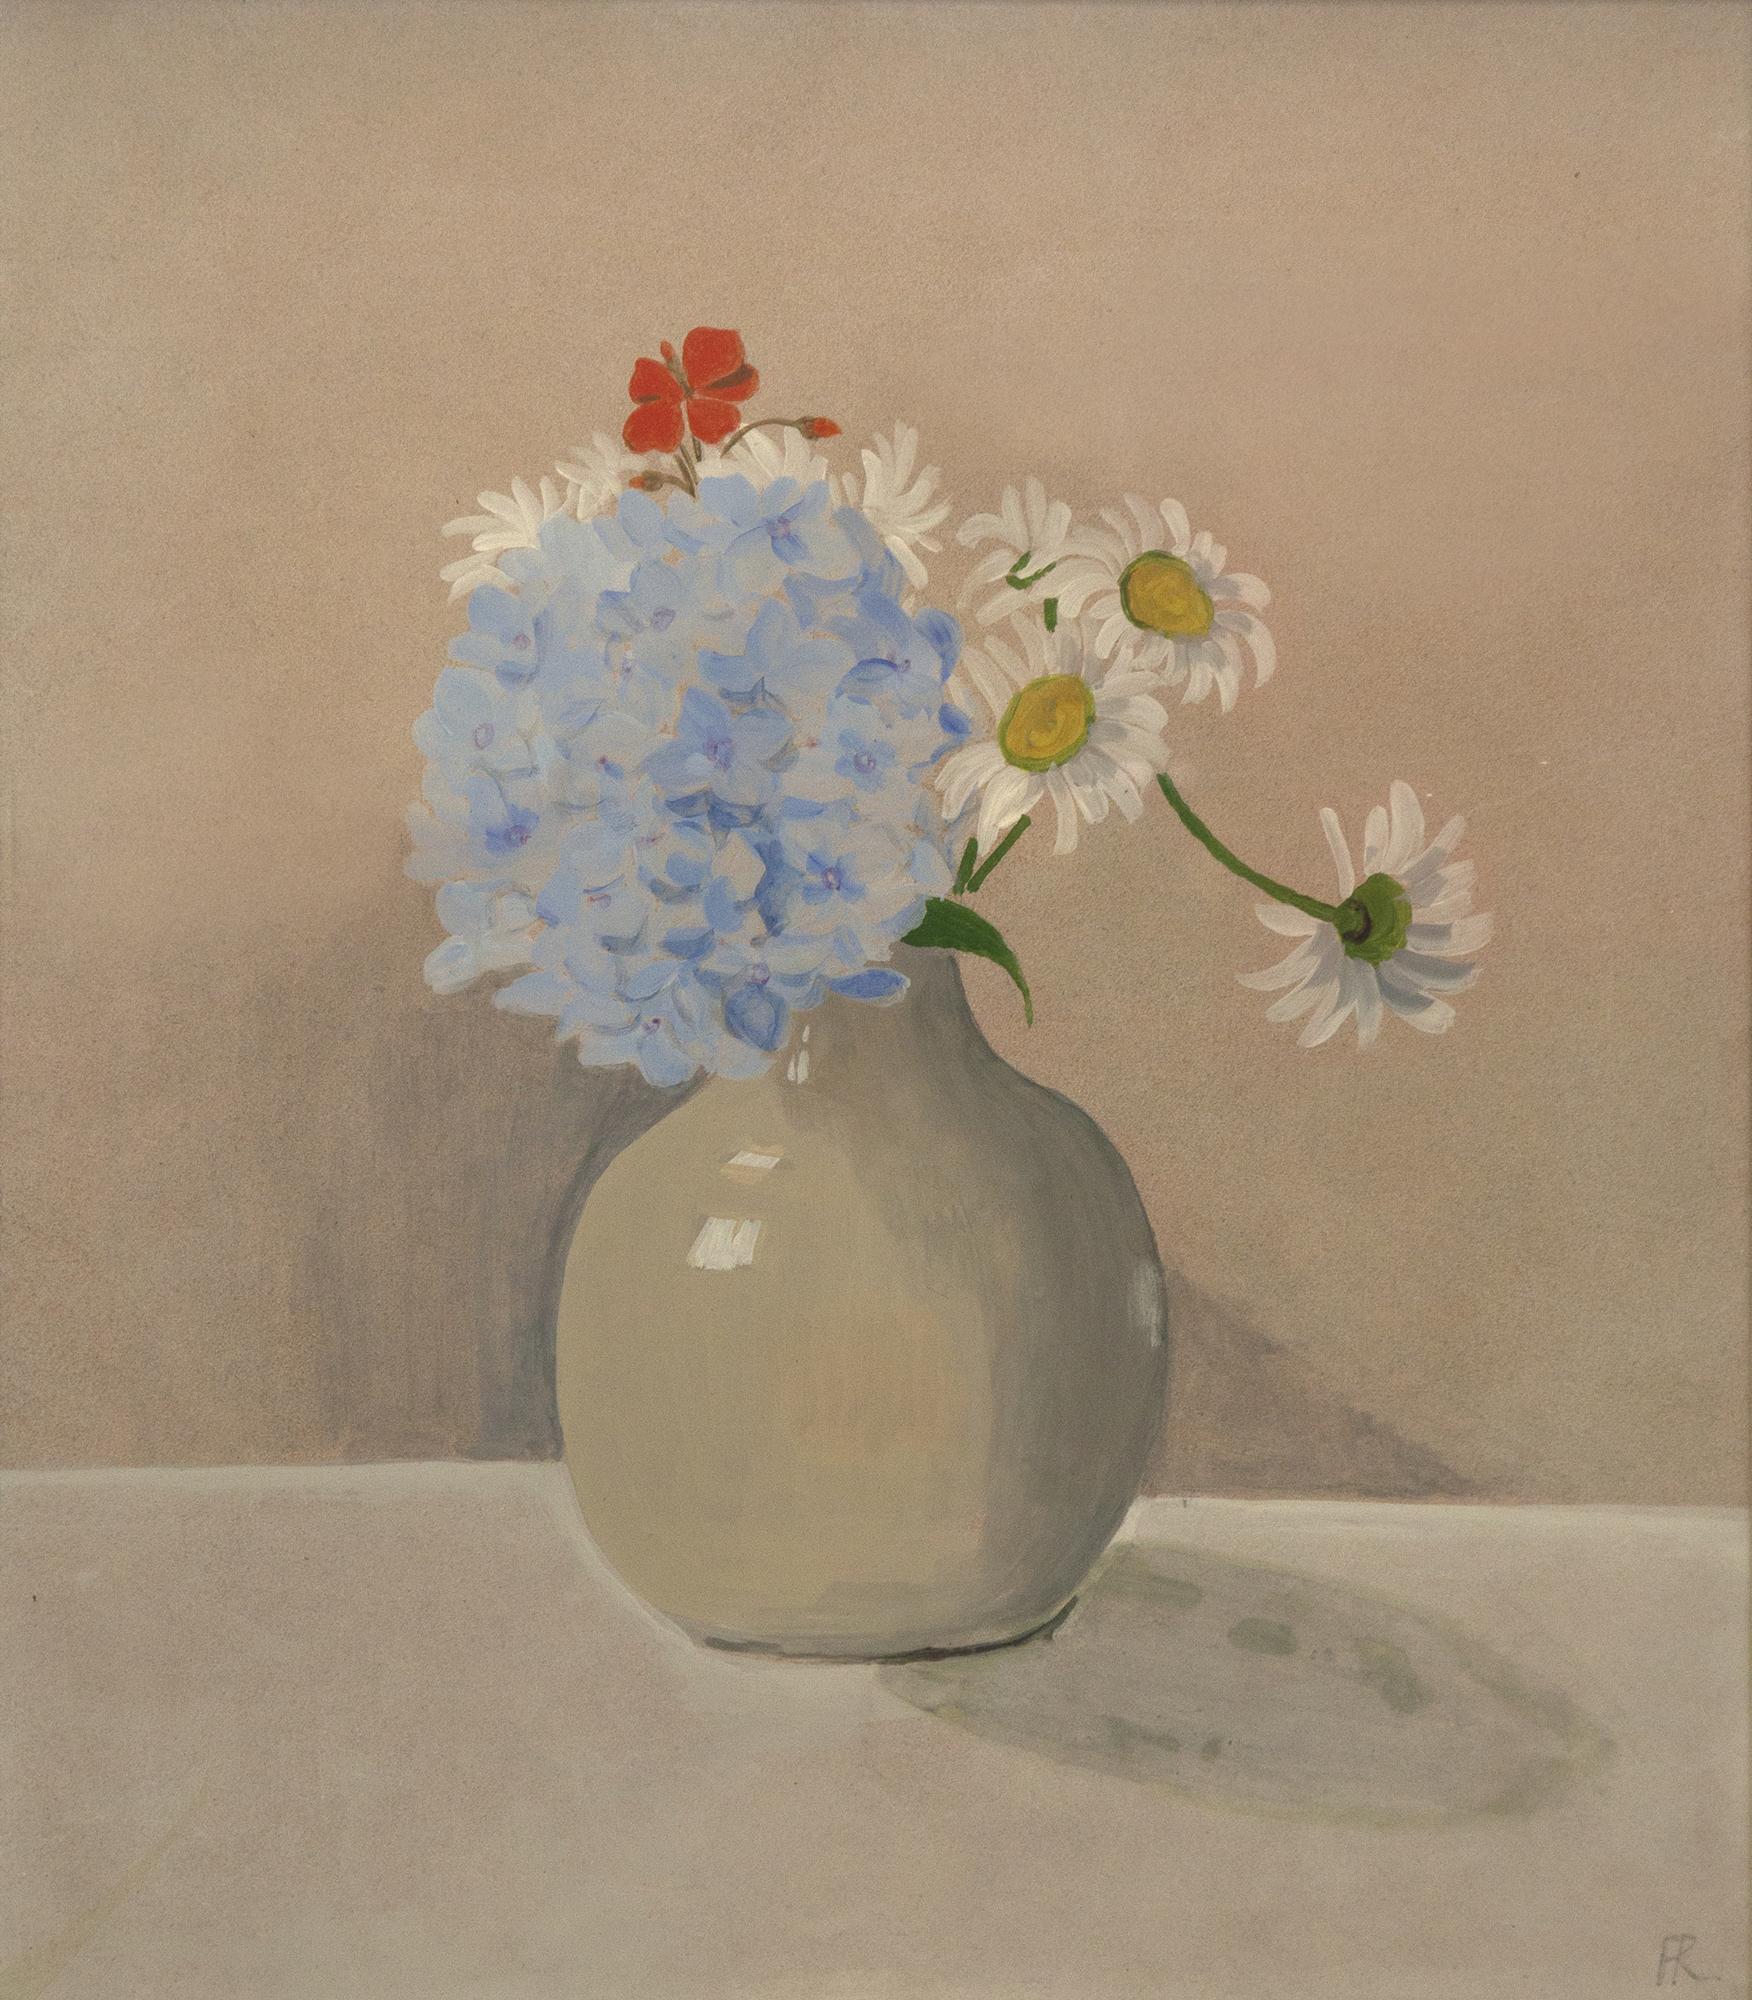 Blue Hydrangea (1973)